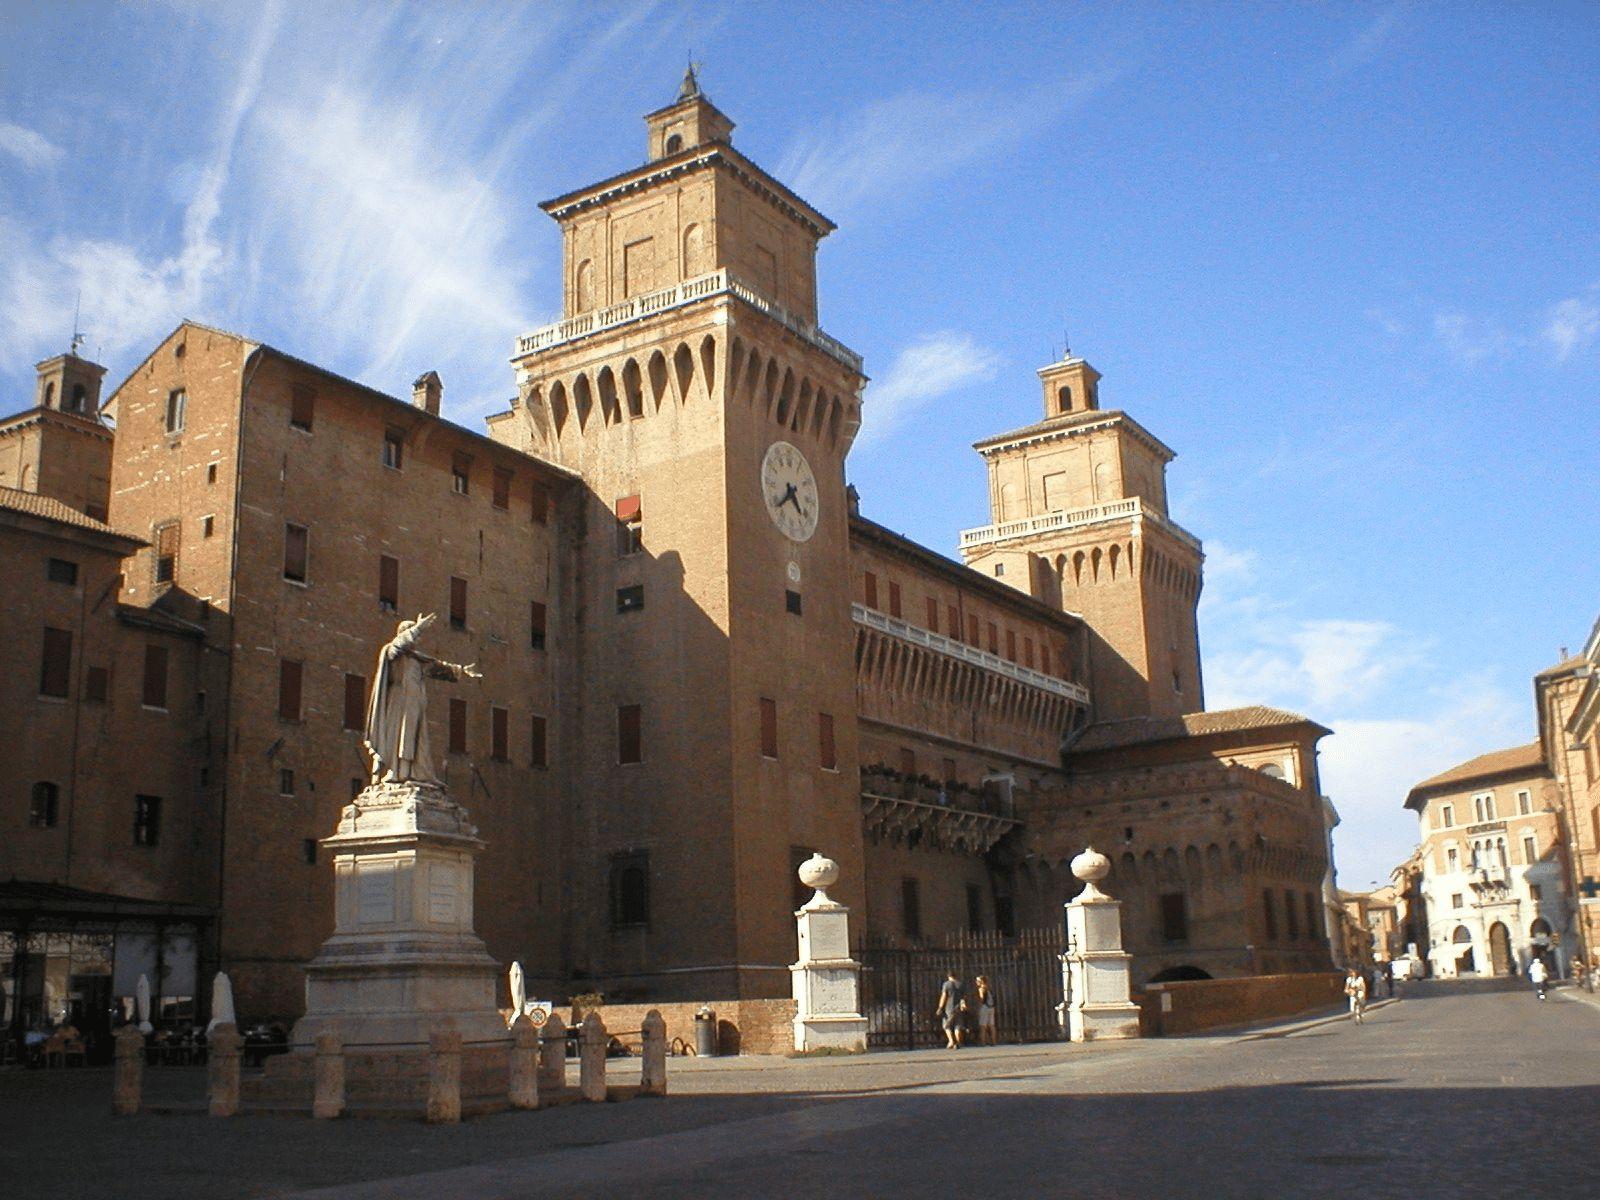 Sjeverna Italija i ljetovalište Rimini: Ferrara